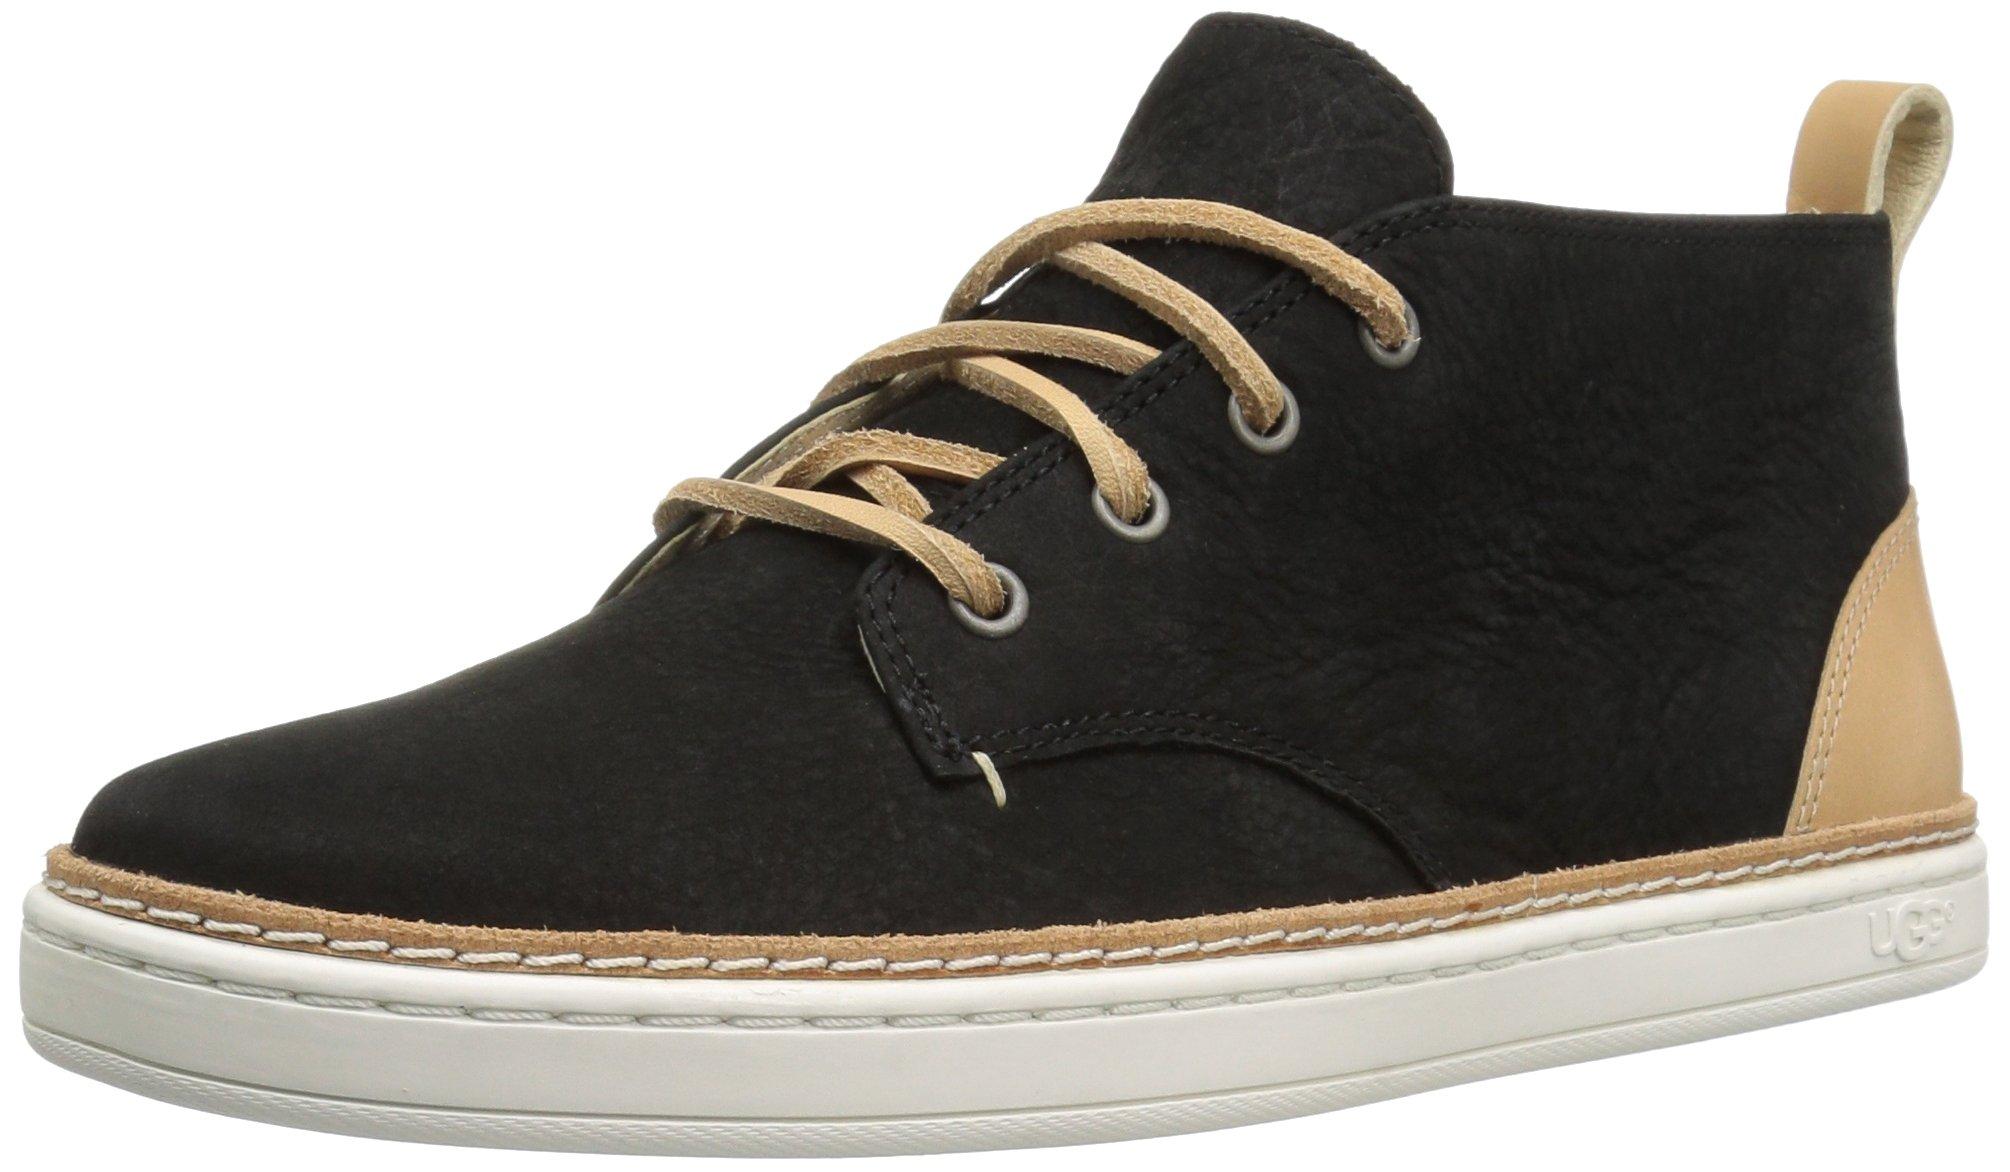 UGG Women's Kallisto Fashion Sneaker, Black, 10 US/10 B US